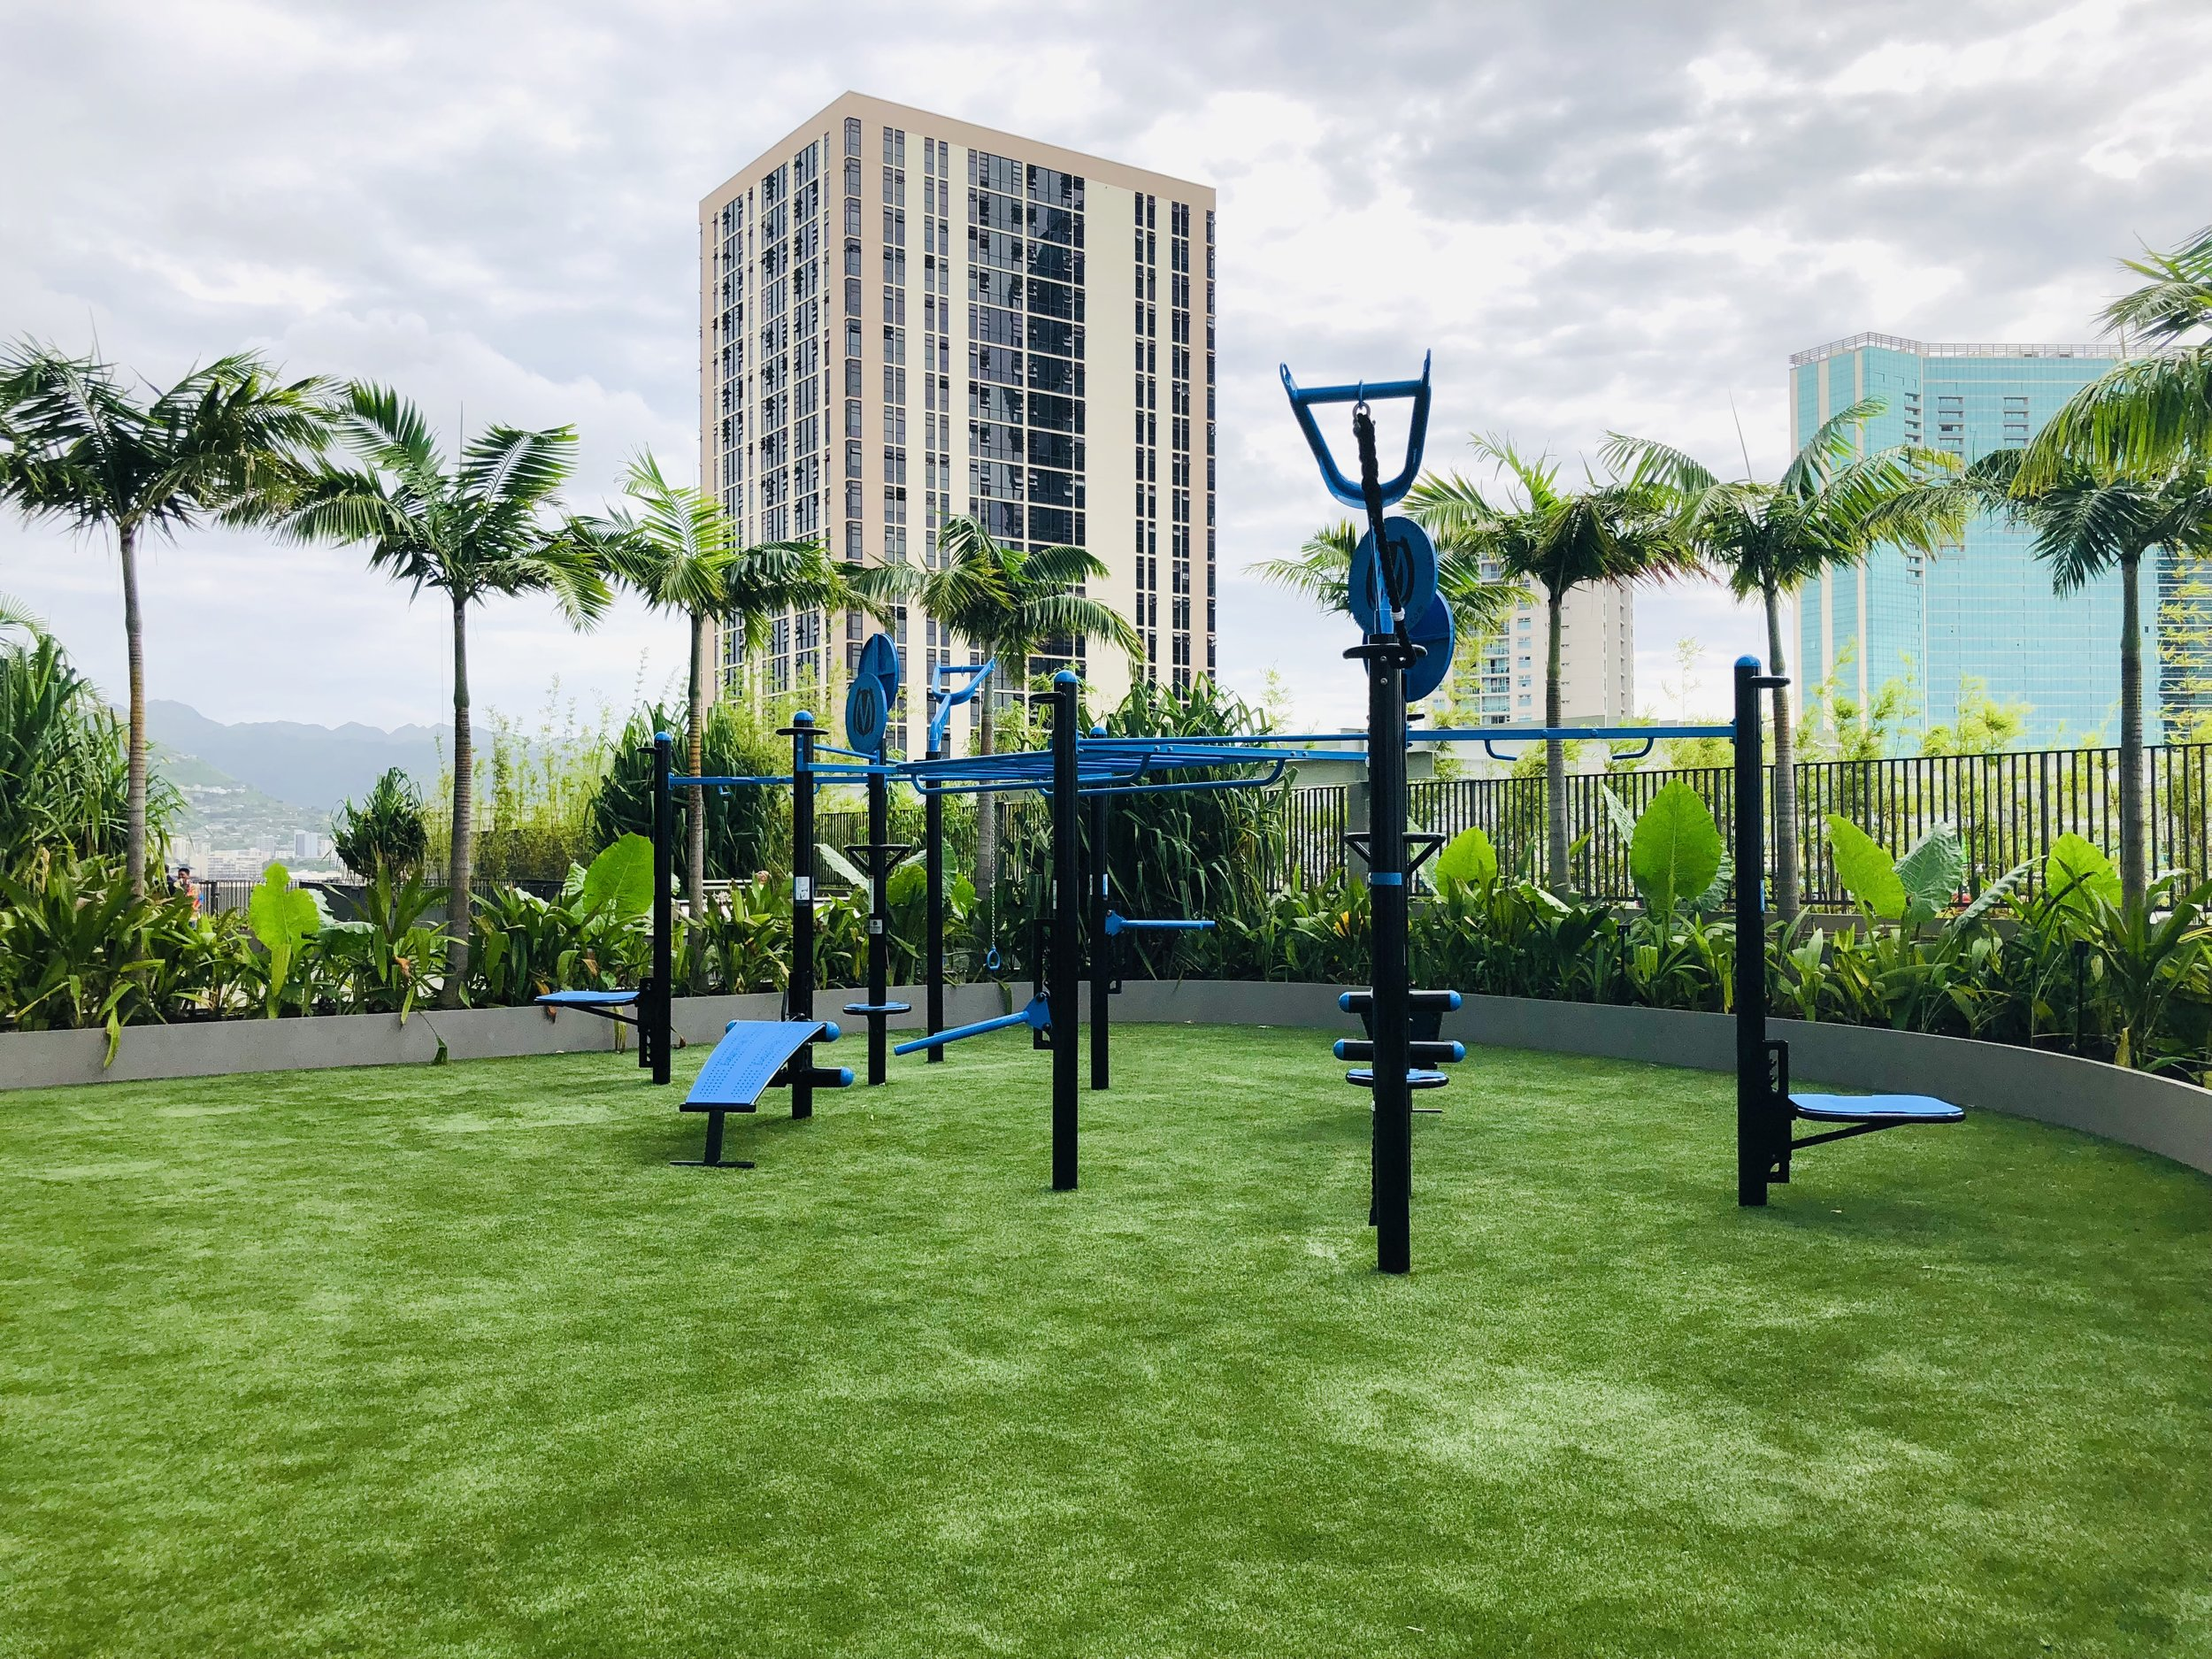 Outdoor Gym Fitness Area Resort